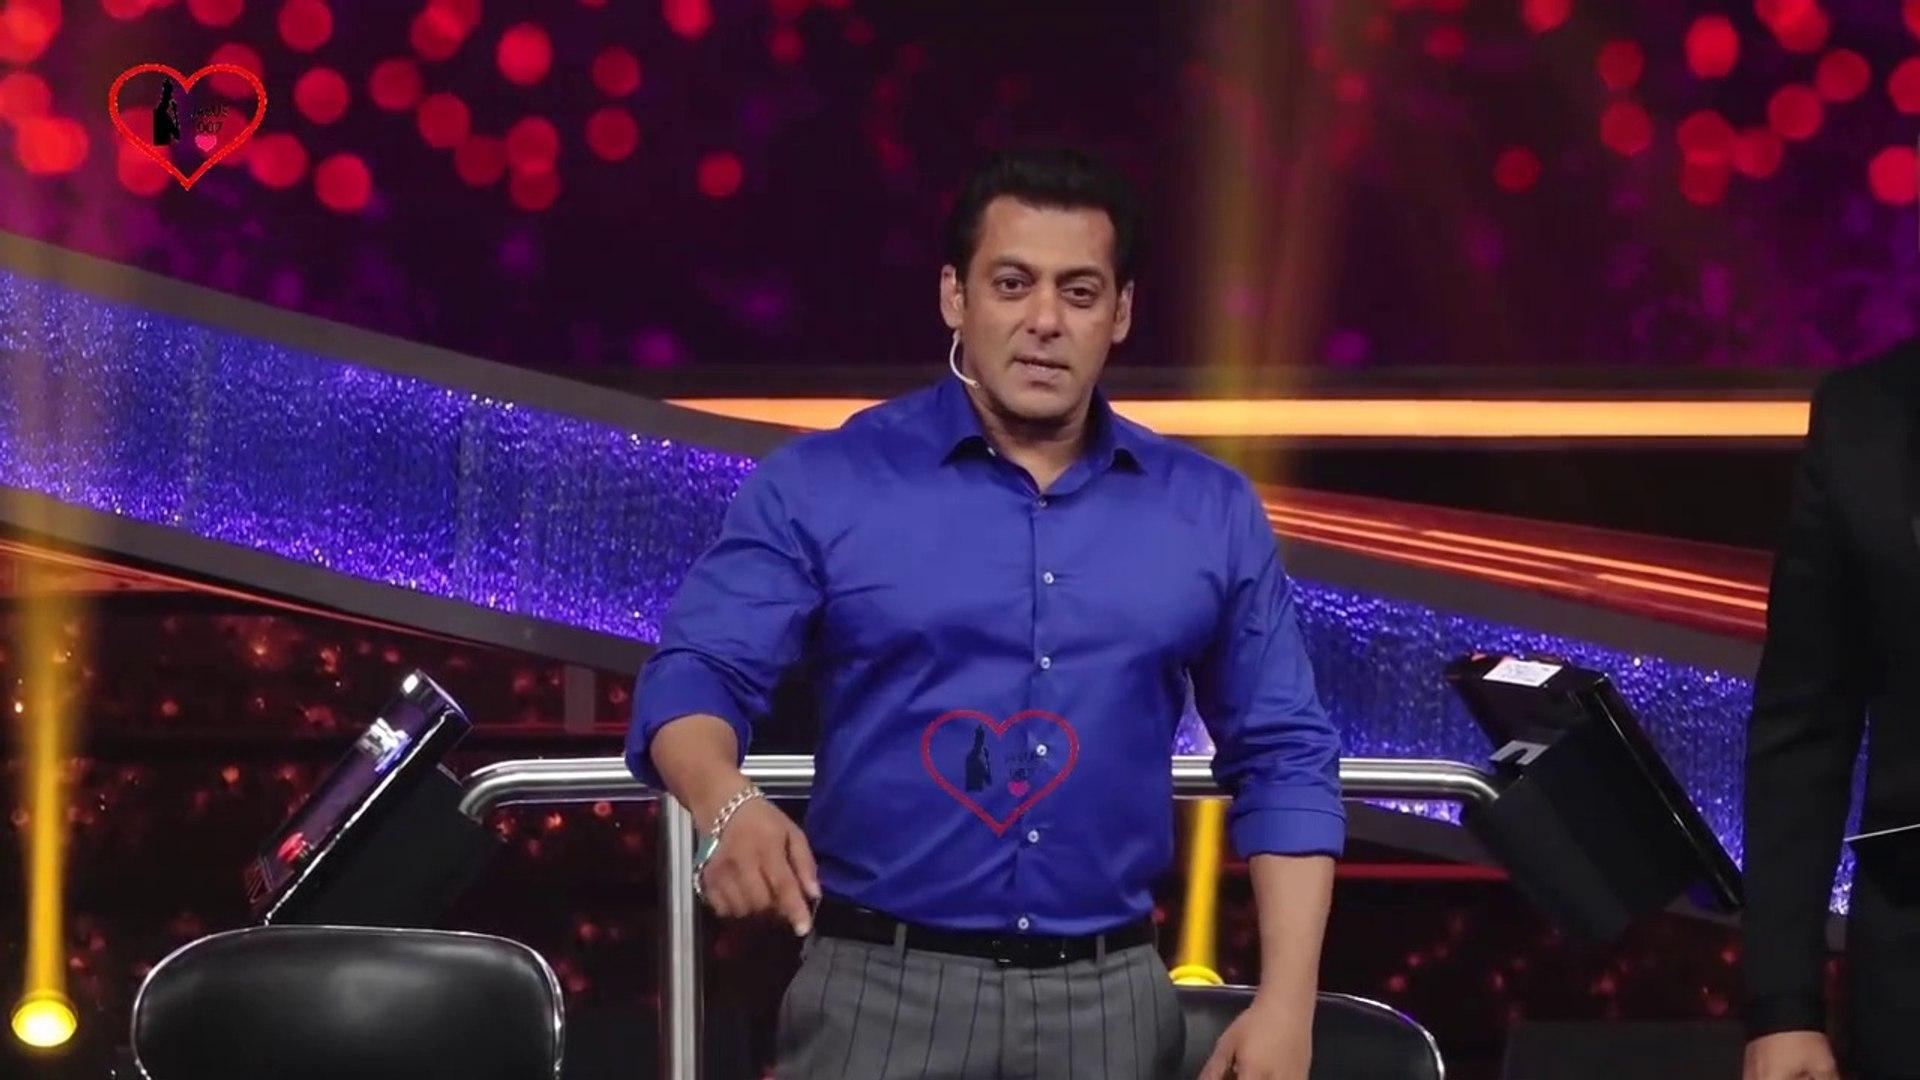 Salman khan RACE 3 TRAILER 2 LAUNCH Very Funny reaction on Race 3 trailer Spoof